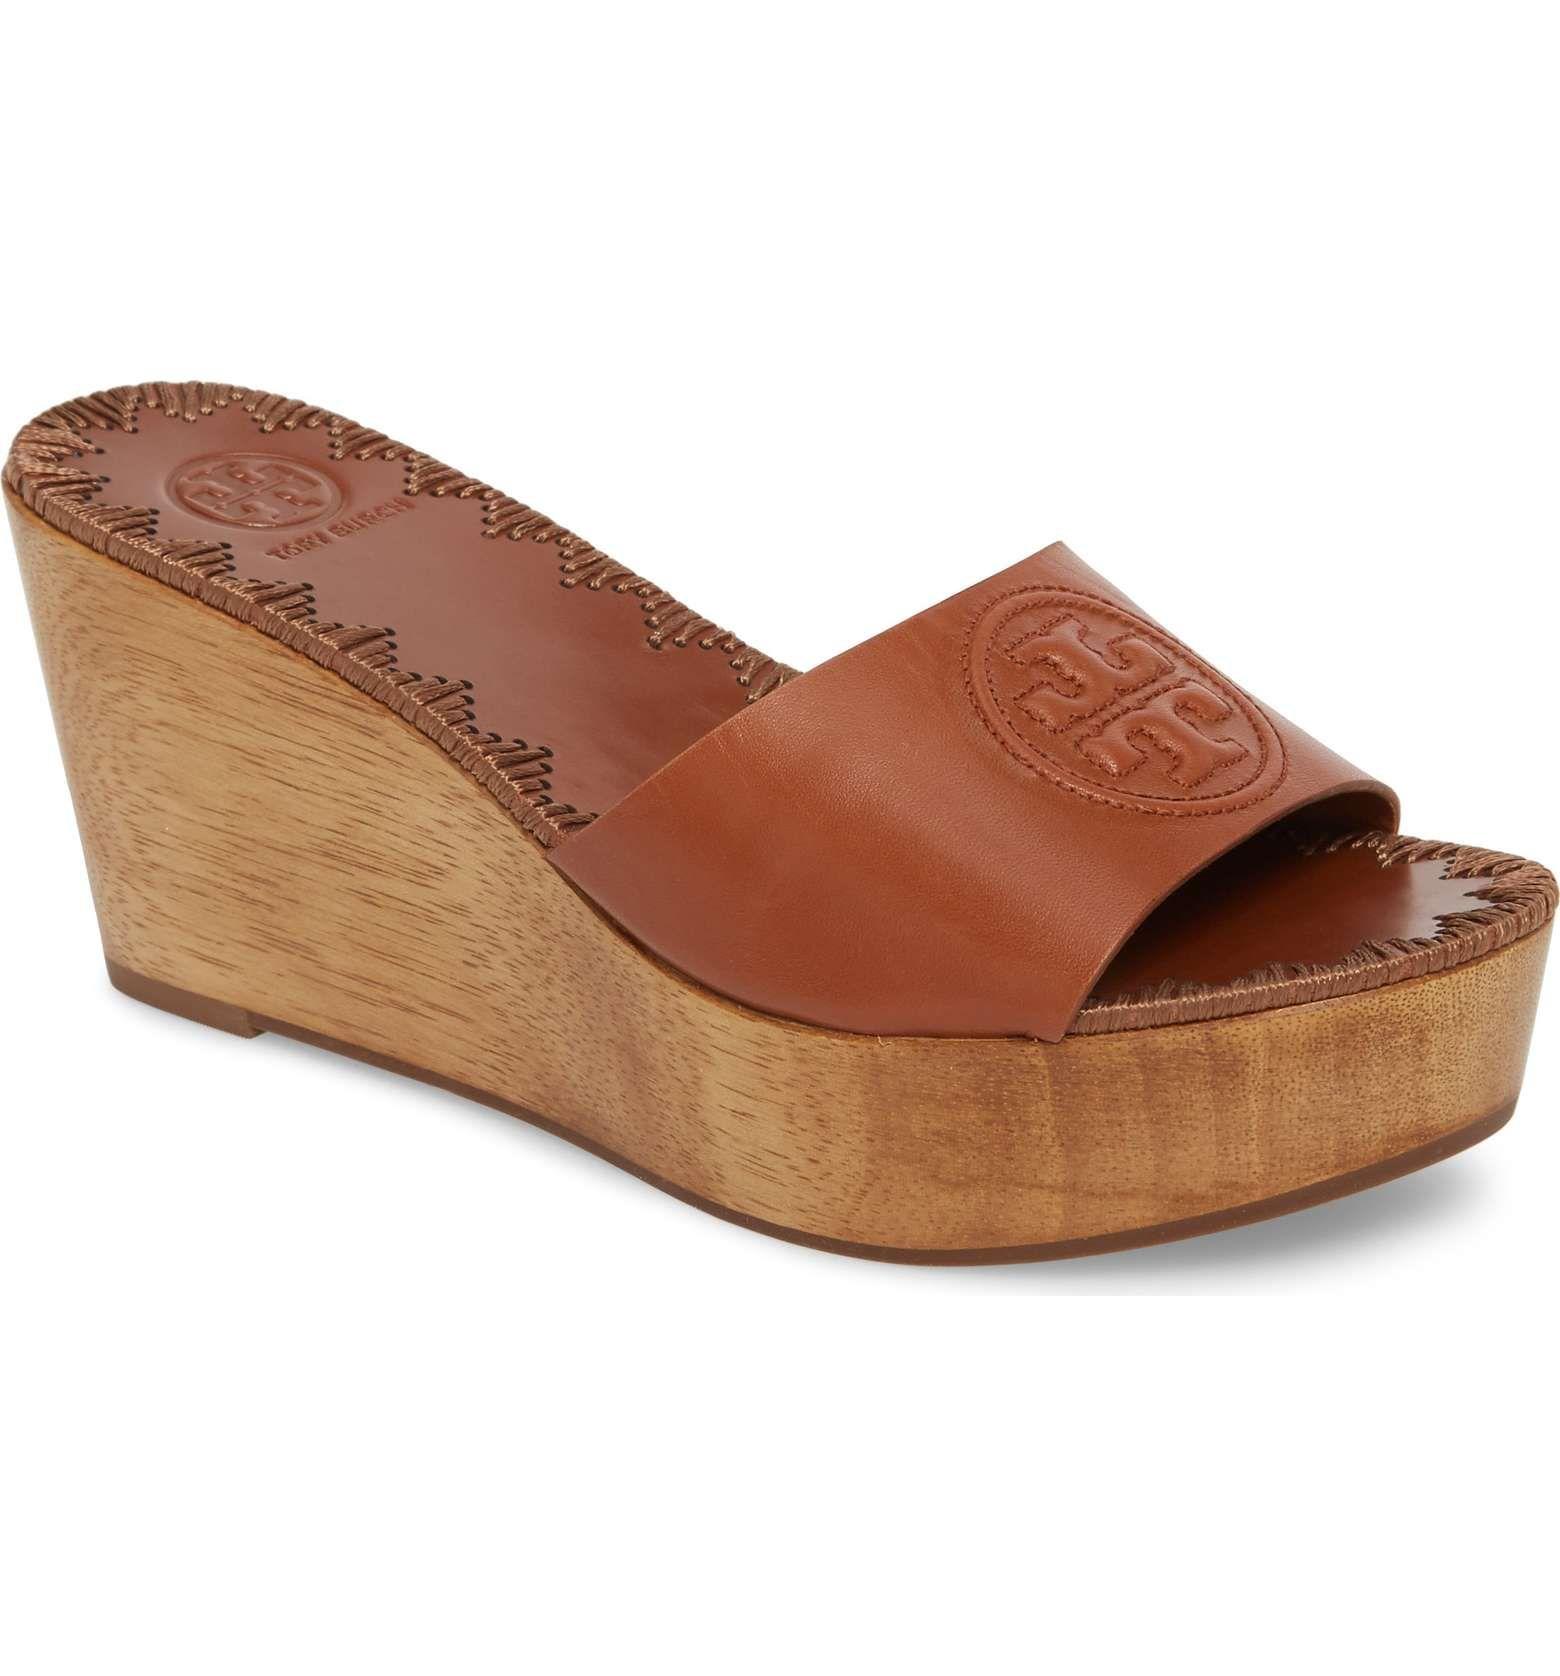 d5992a20a55dd2 Main Image - Tory Burch Patty Logo Platform Wedge Sandal (Women ...